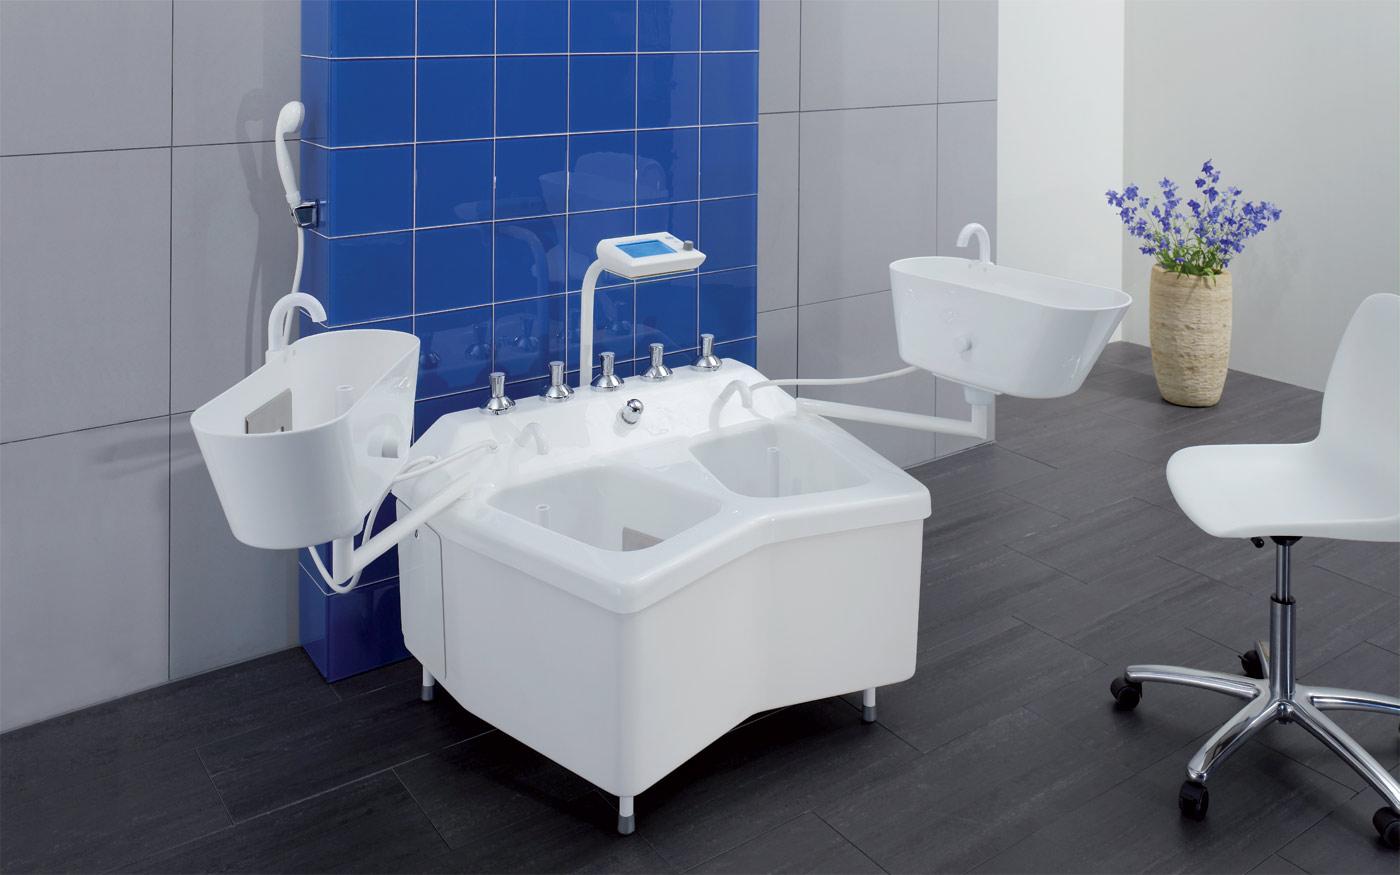 Vierzellenbad_UN_Dr.Schuhfried_Medizintechnik